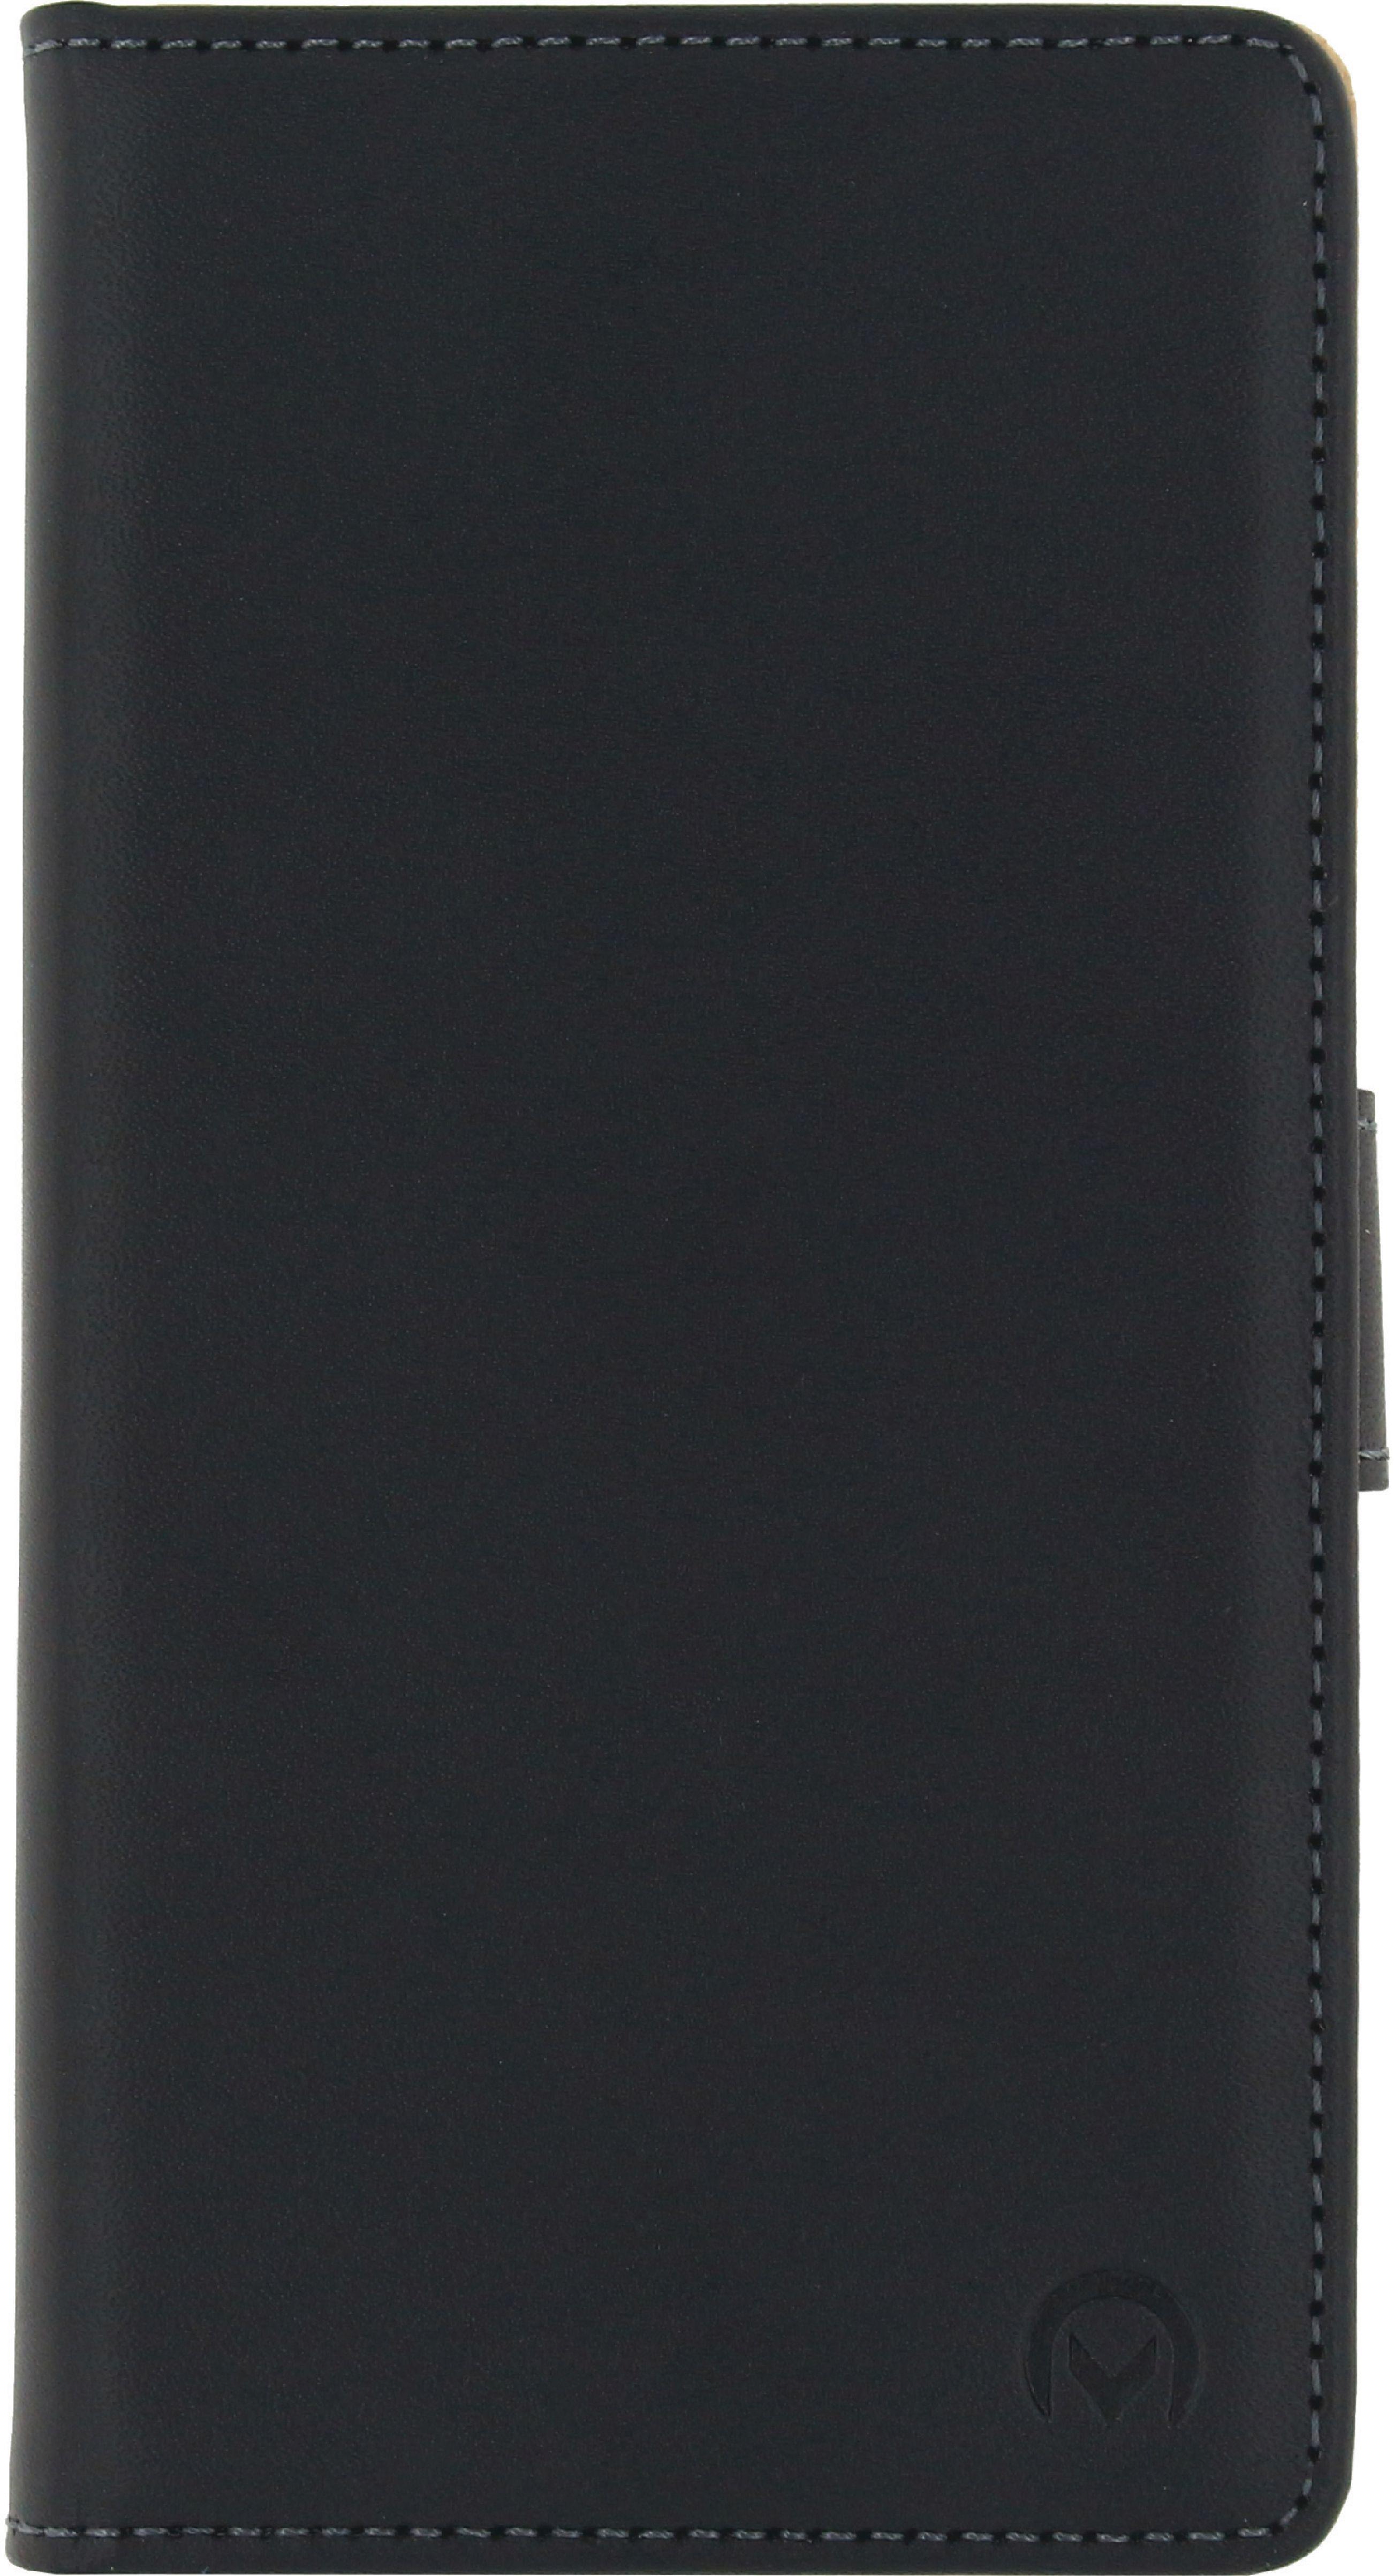 Image of   Telefon Klassisk Lommebogsetui Apple iPhone 7 / Apple iPhone 8 Sort